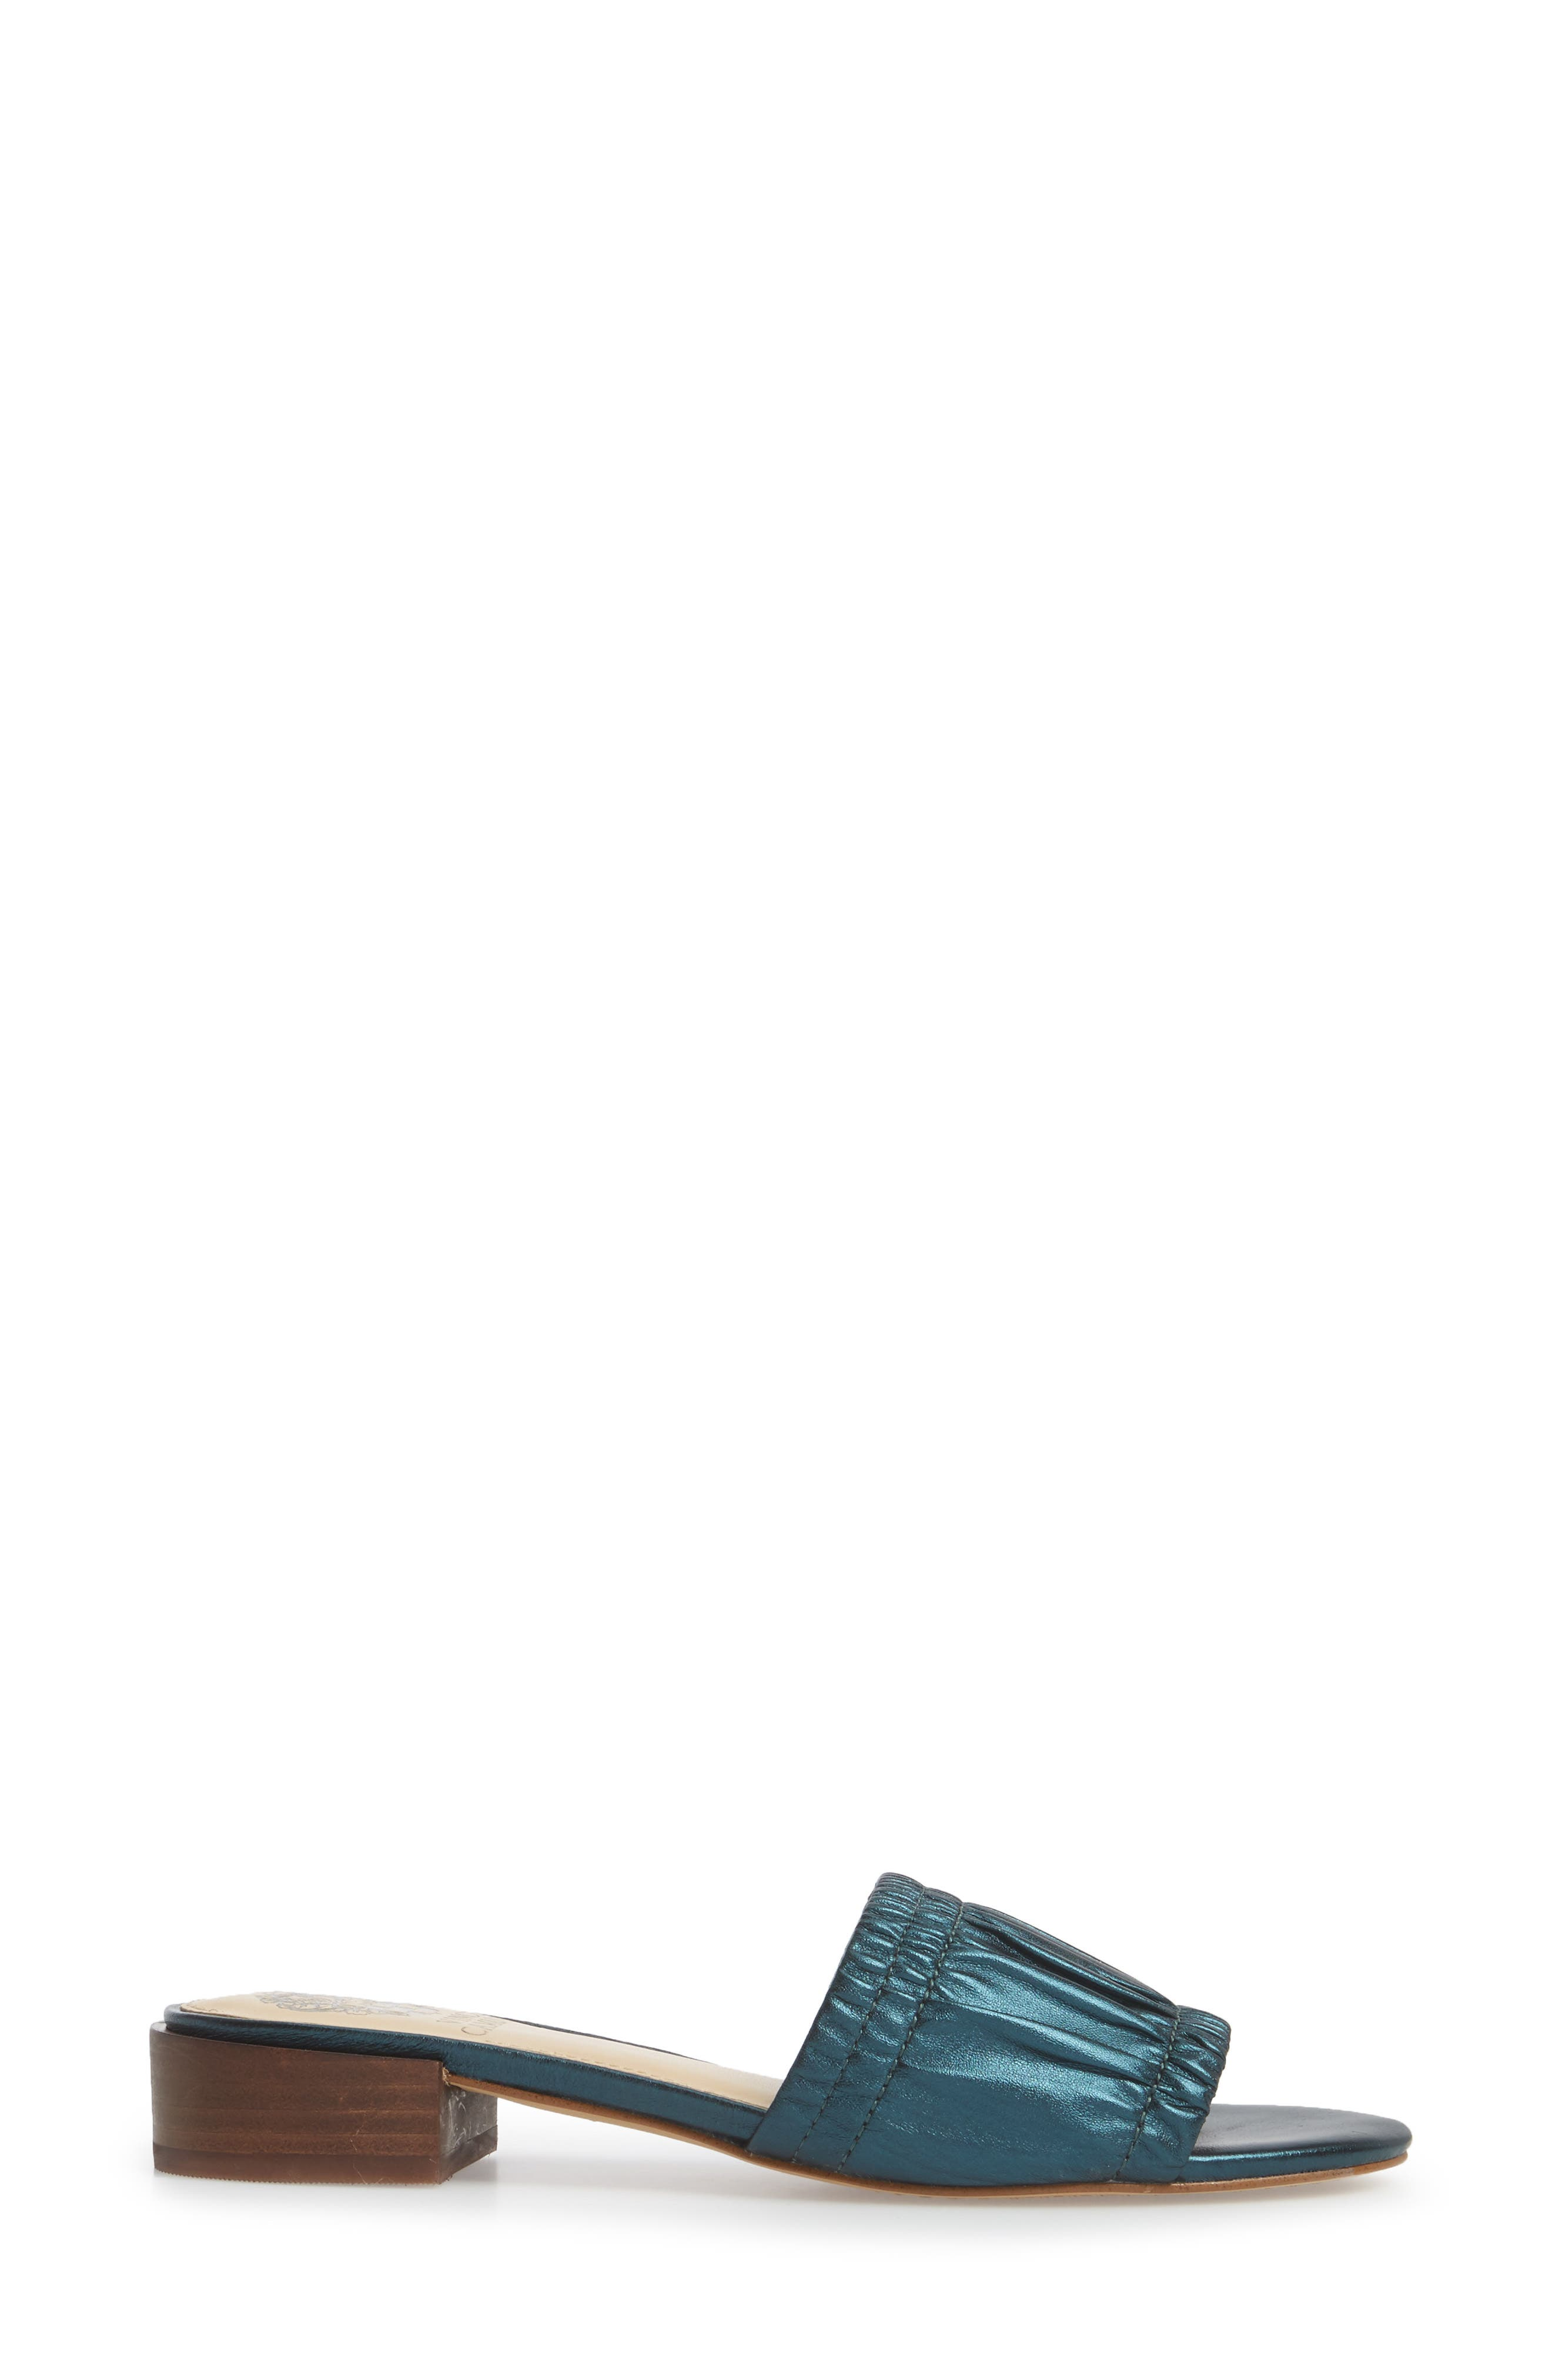 Nanita Pleated Slide Sandal,                             Alternate thumbnail 3, color,                             Metal Teal Fabric